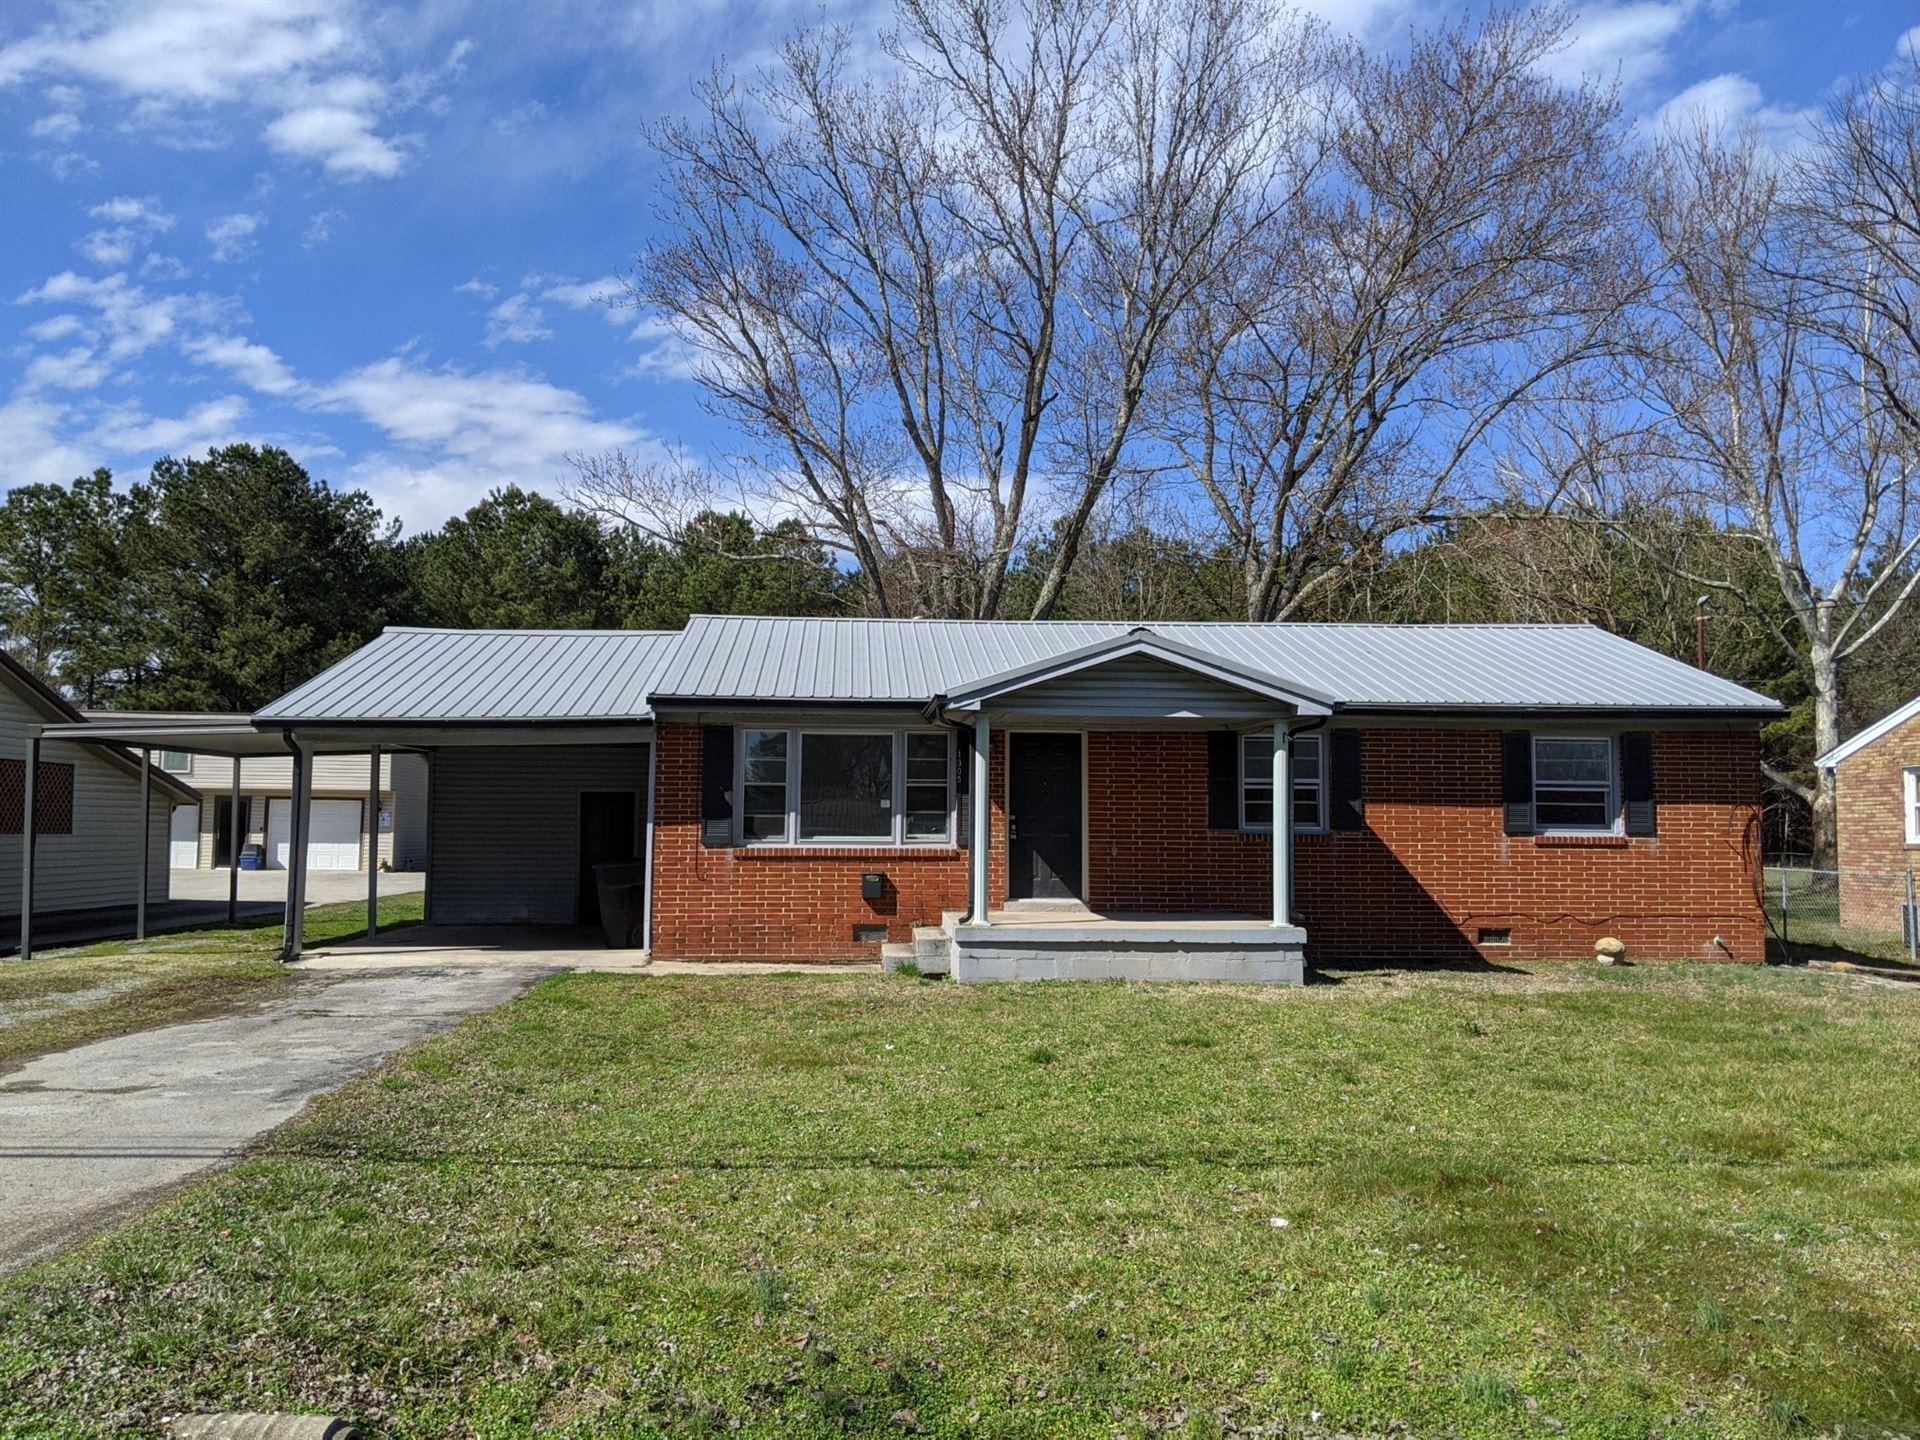 1305 E Grundy St, Tullahoma, TN 37388 - MLS#: 2232499